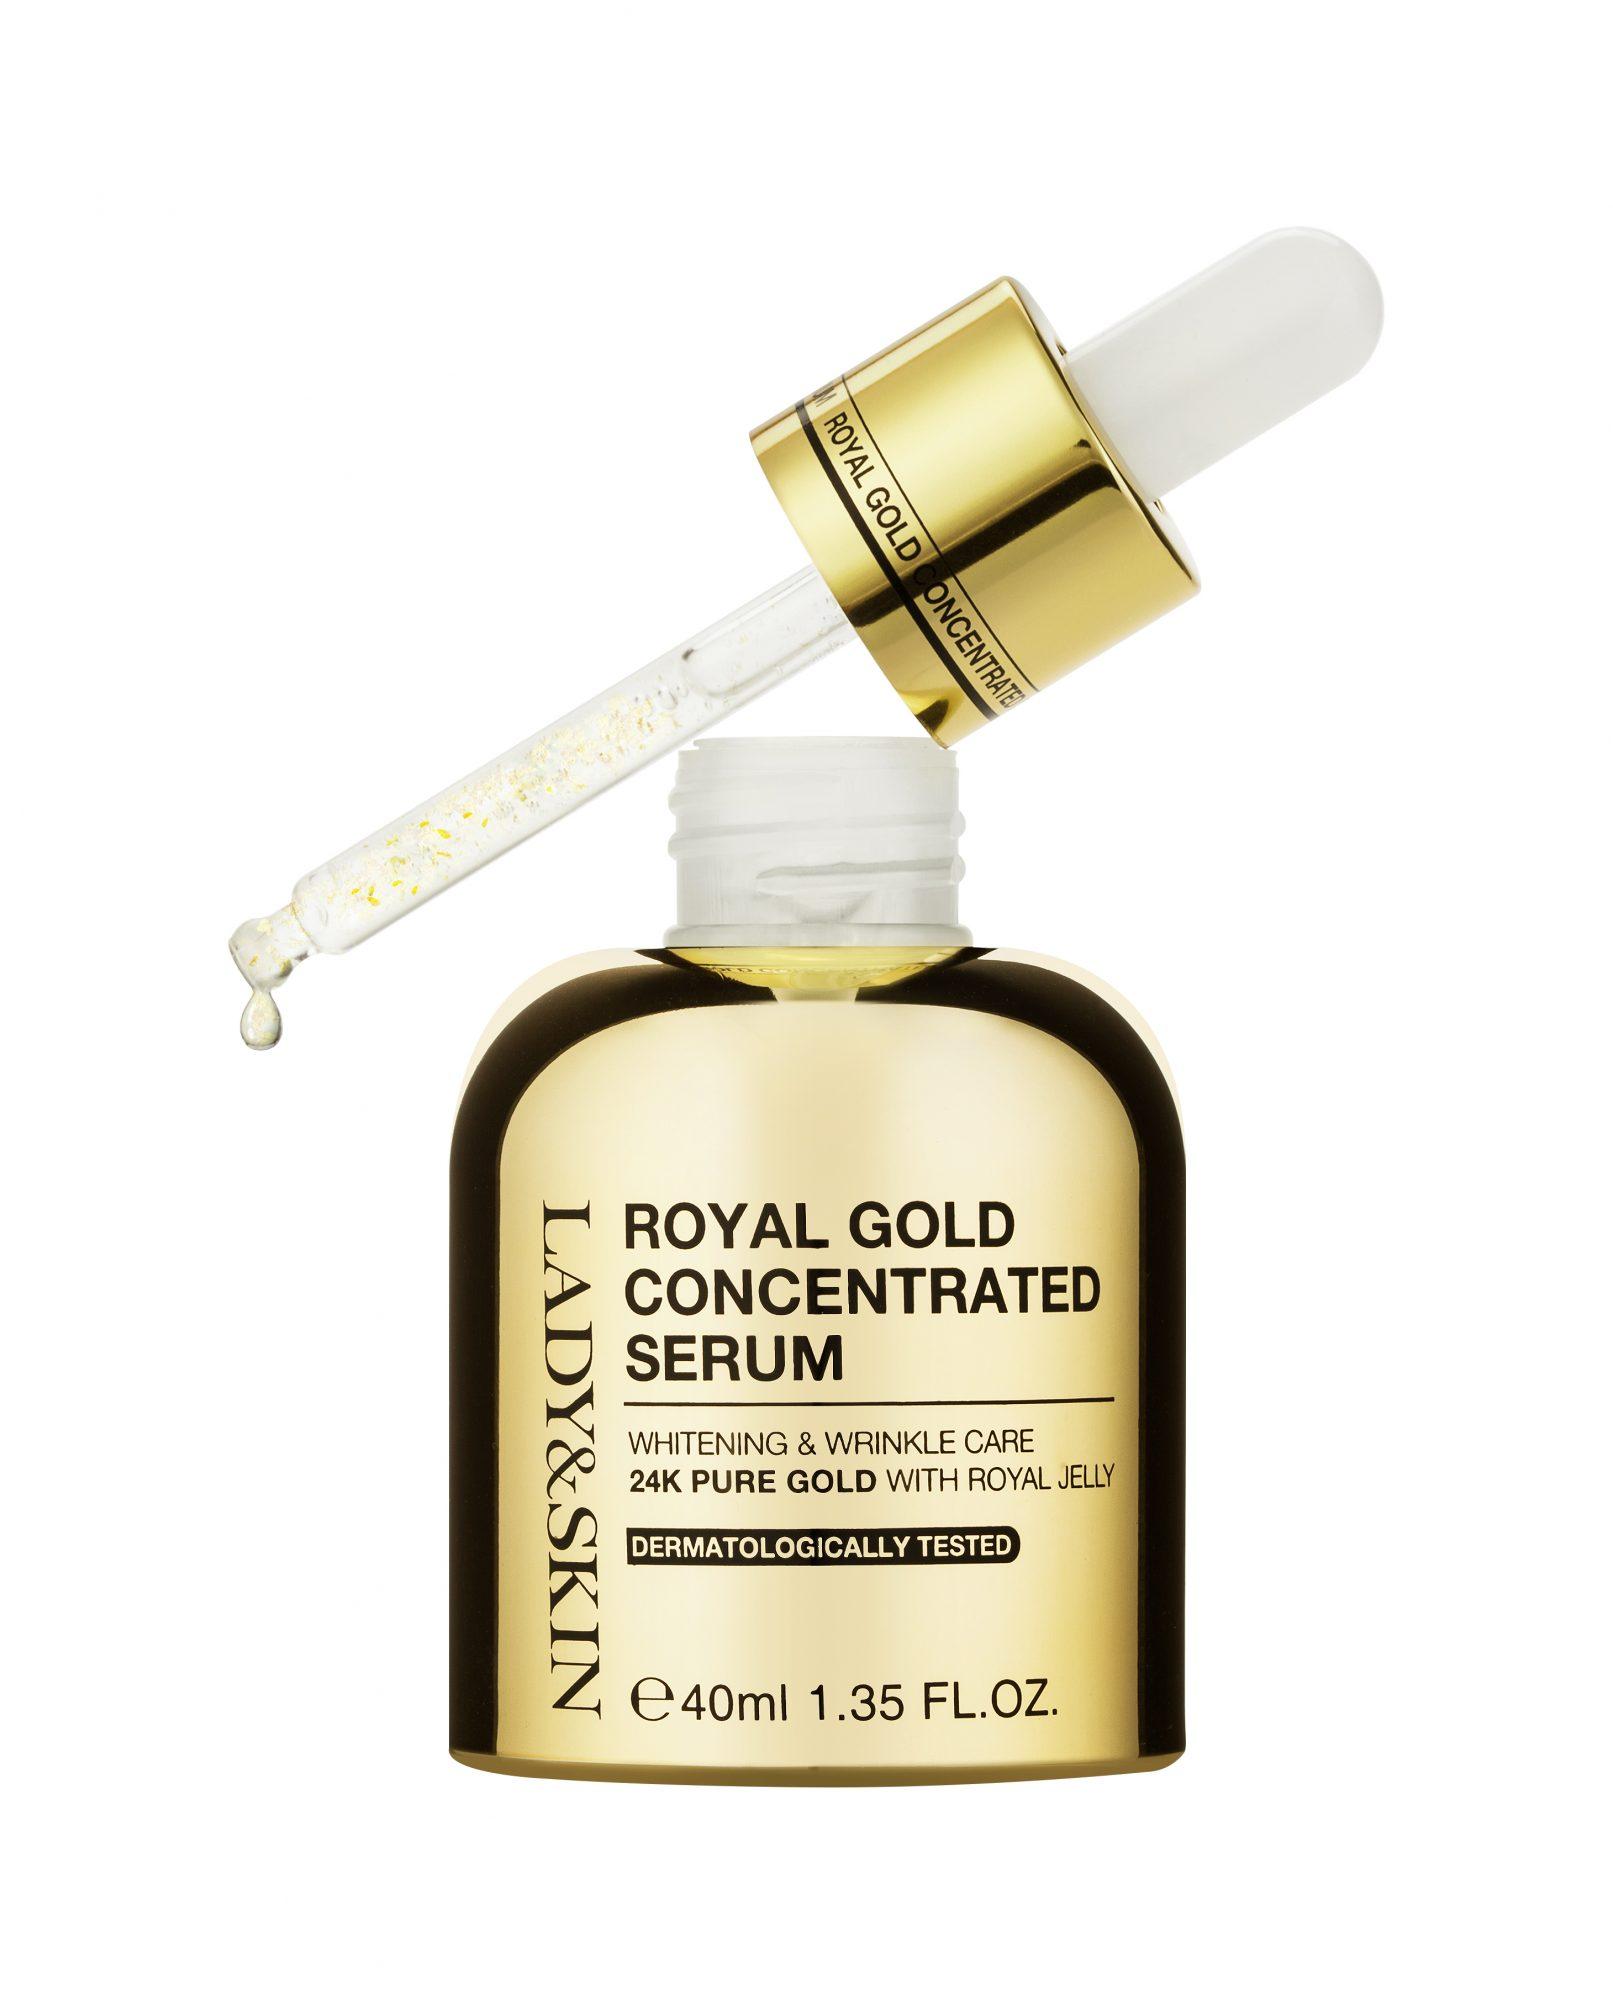 Royal-Gold-Concentrated-Serum-V2.jpg